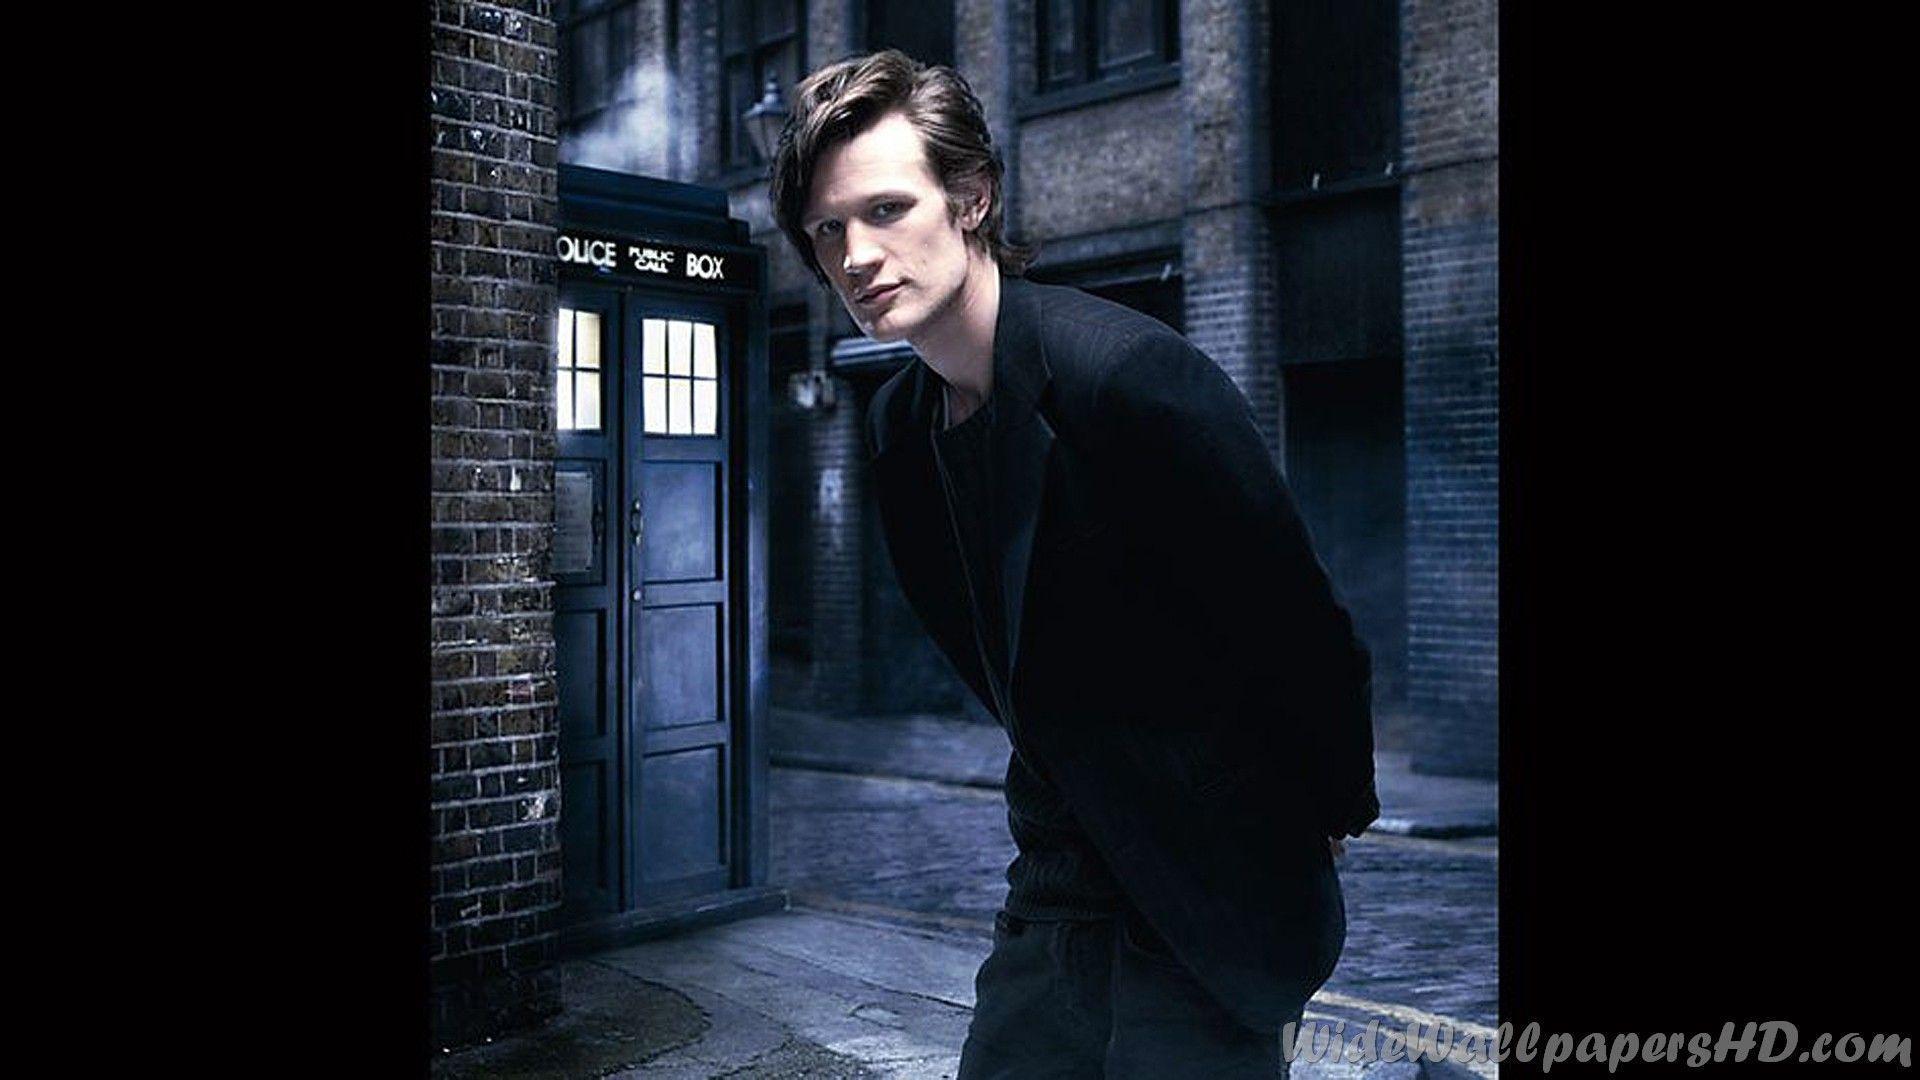 Doctor Who Matt Smith Wallpapers 1920x1080